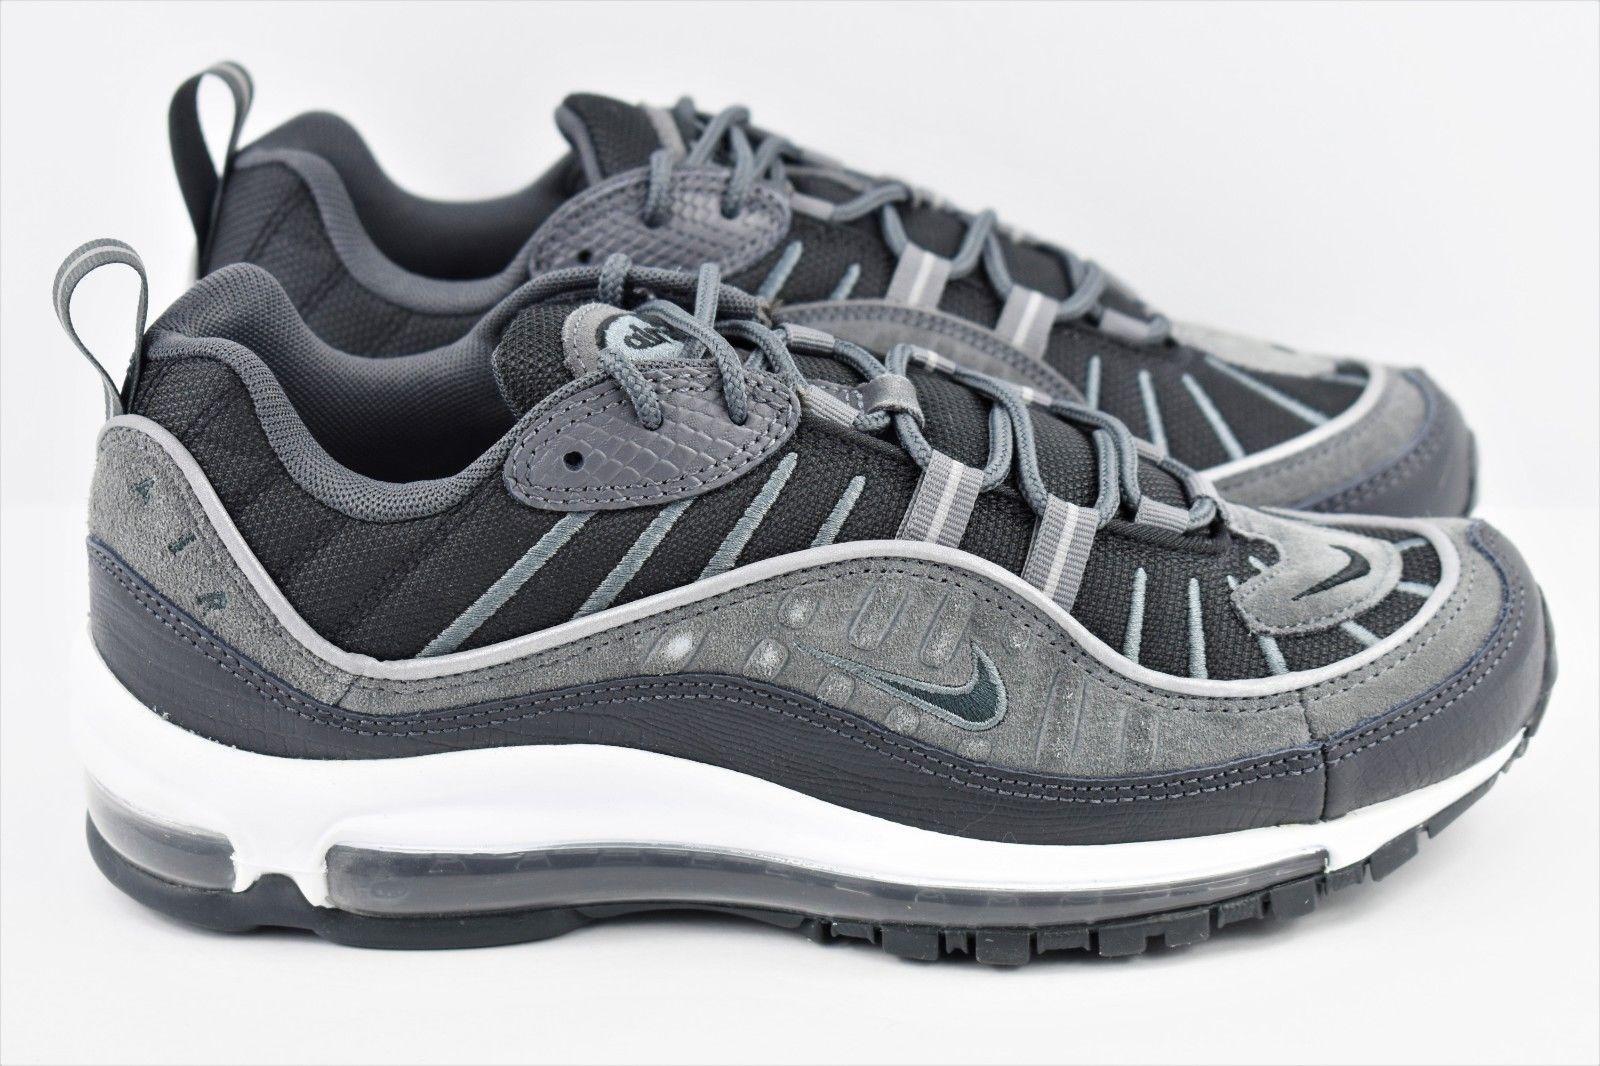 Nike Air Max 98 SE BlackAnthracite AO9380 001